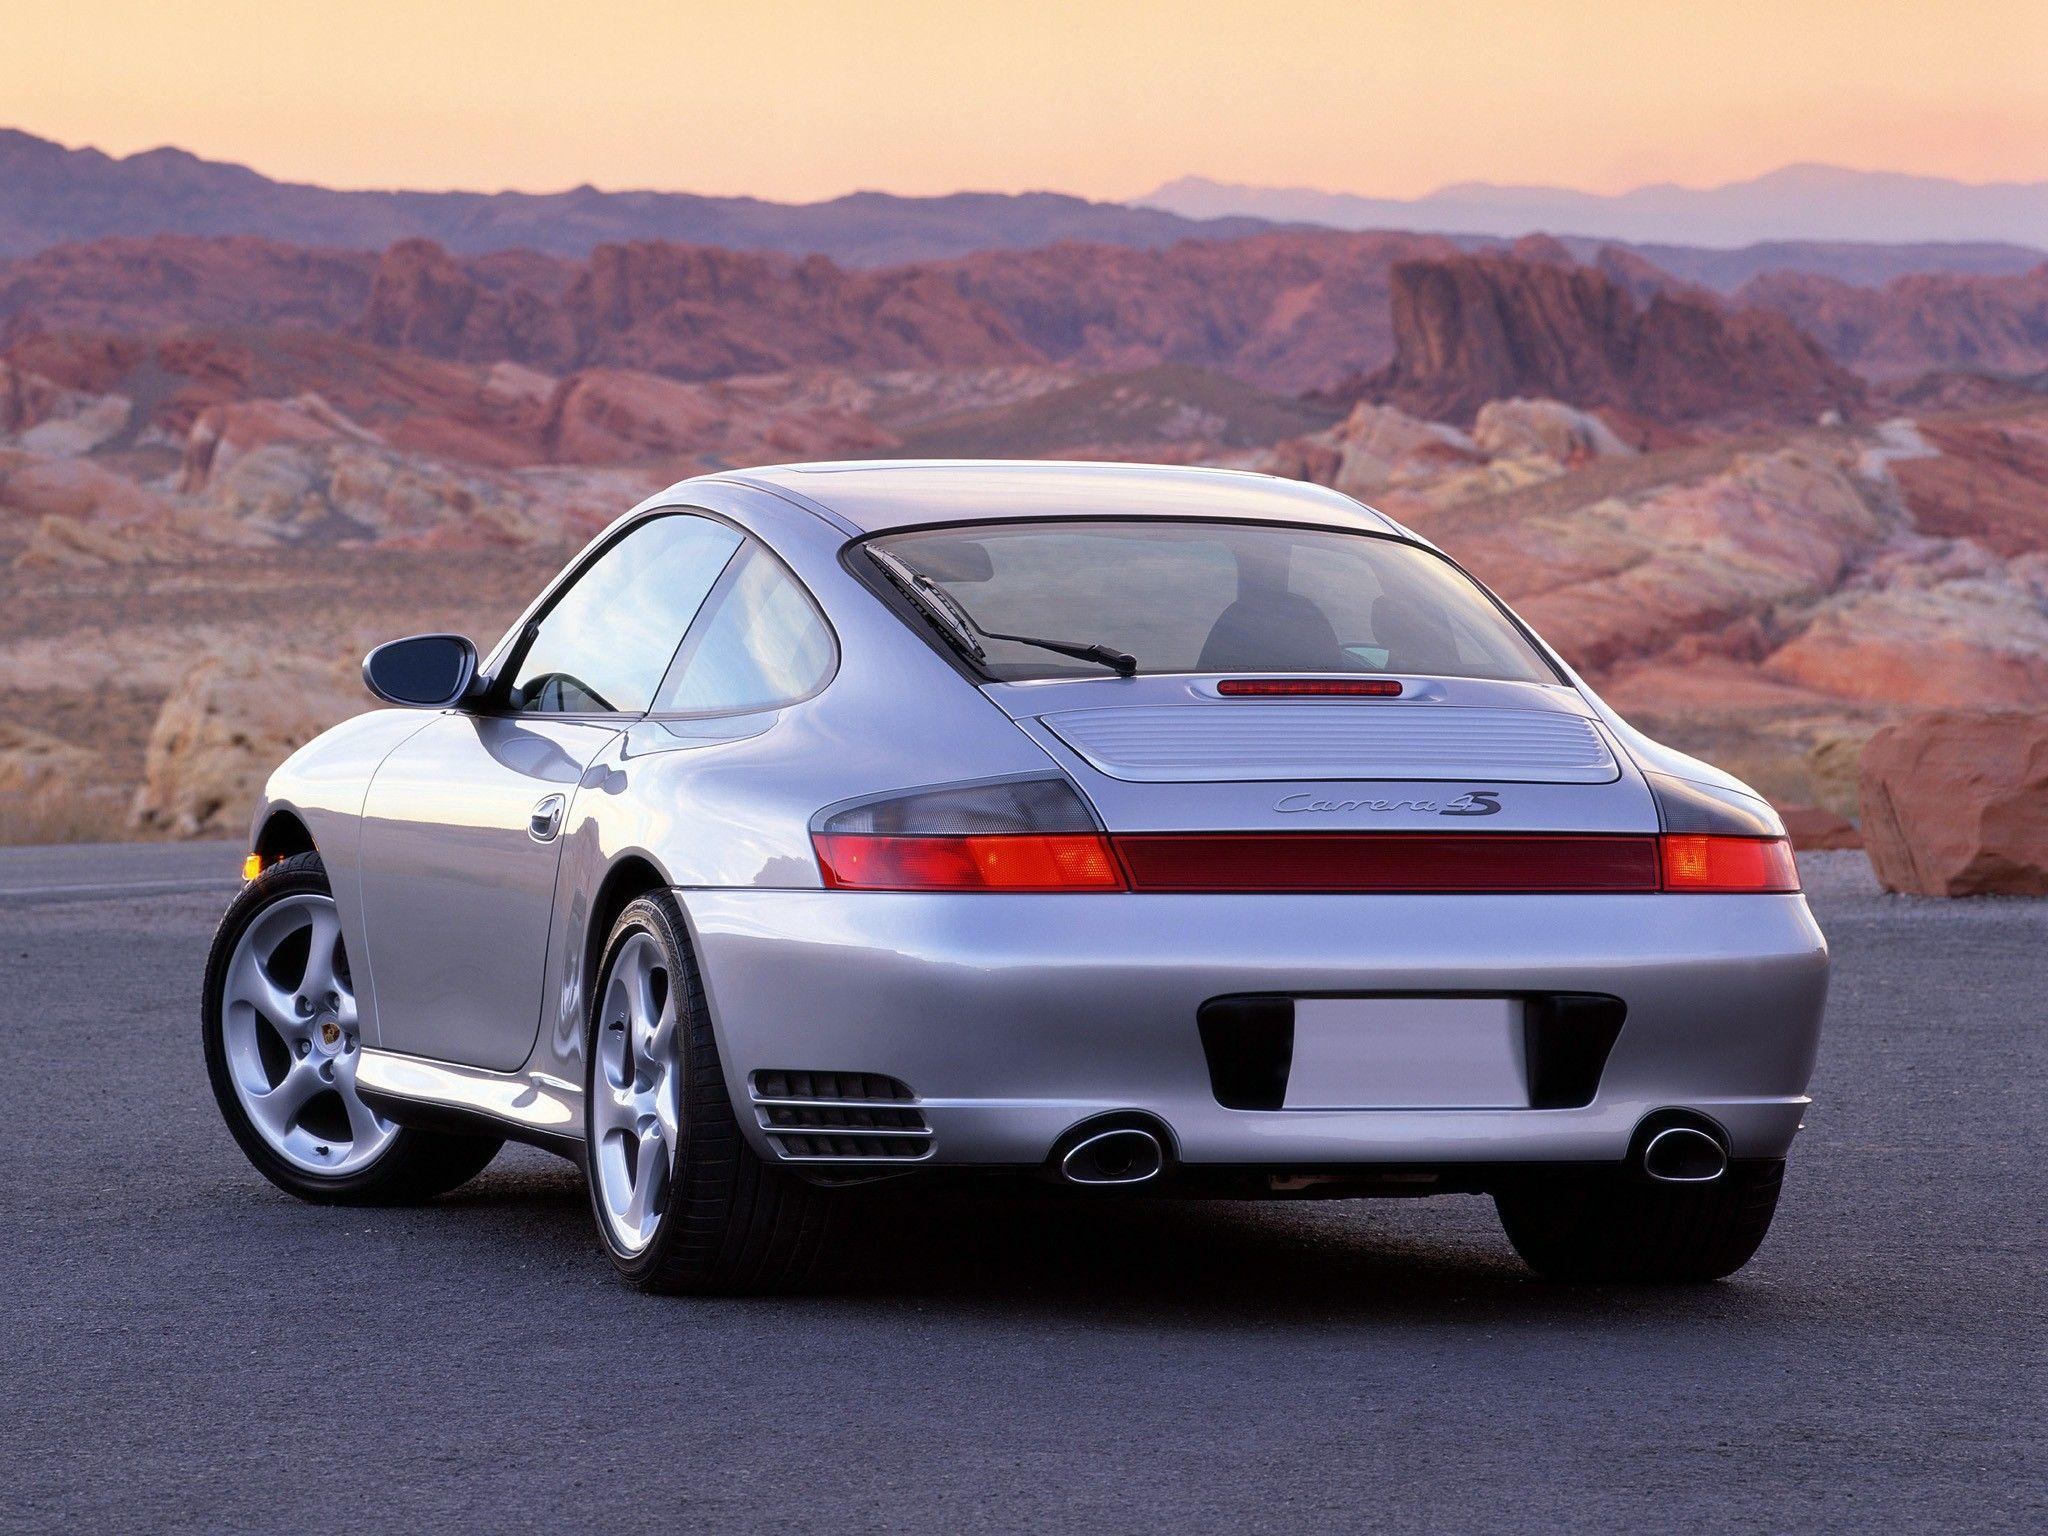 996 2 Porsche 911 Carrera 4s Porsche 911 911 Carrera 4s